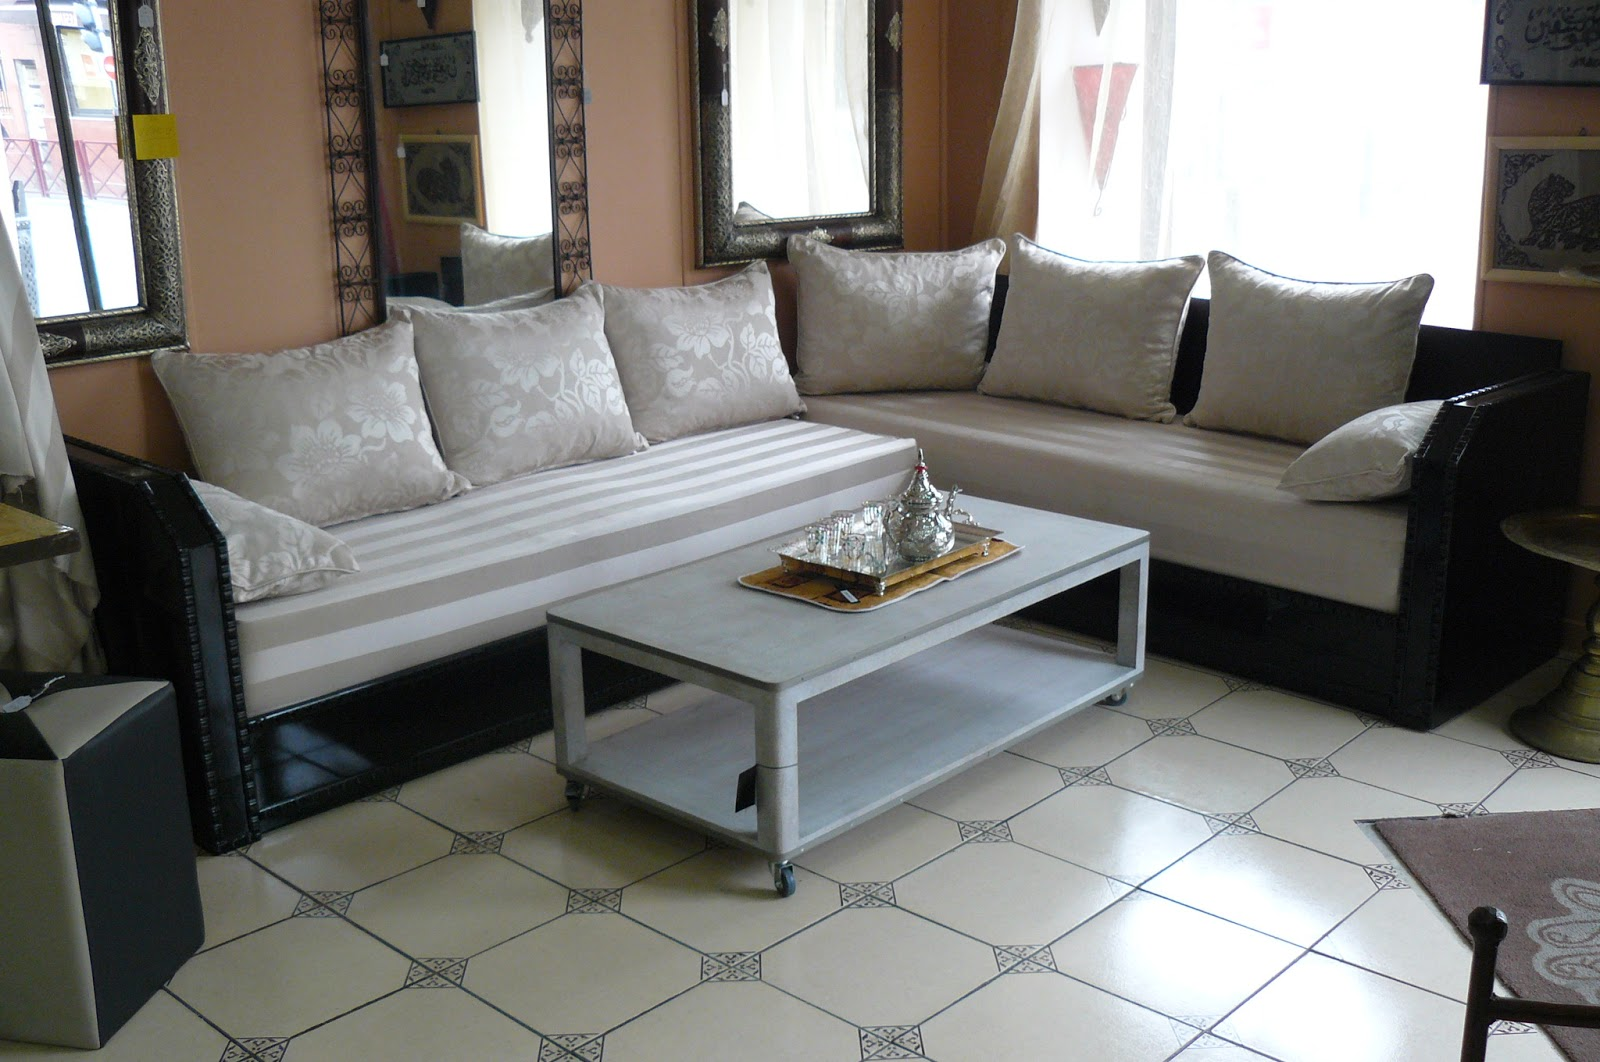 Salon marocain moderne prix - Photo de salon marocain moderne ...